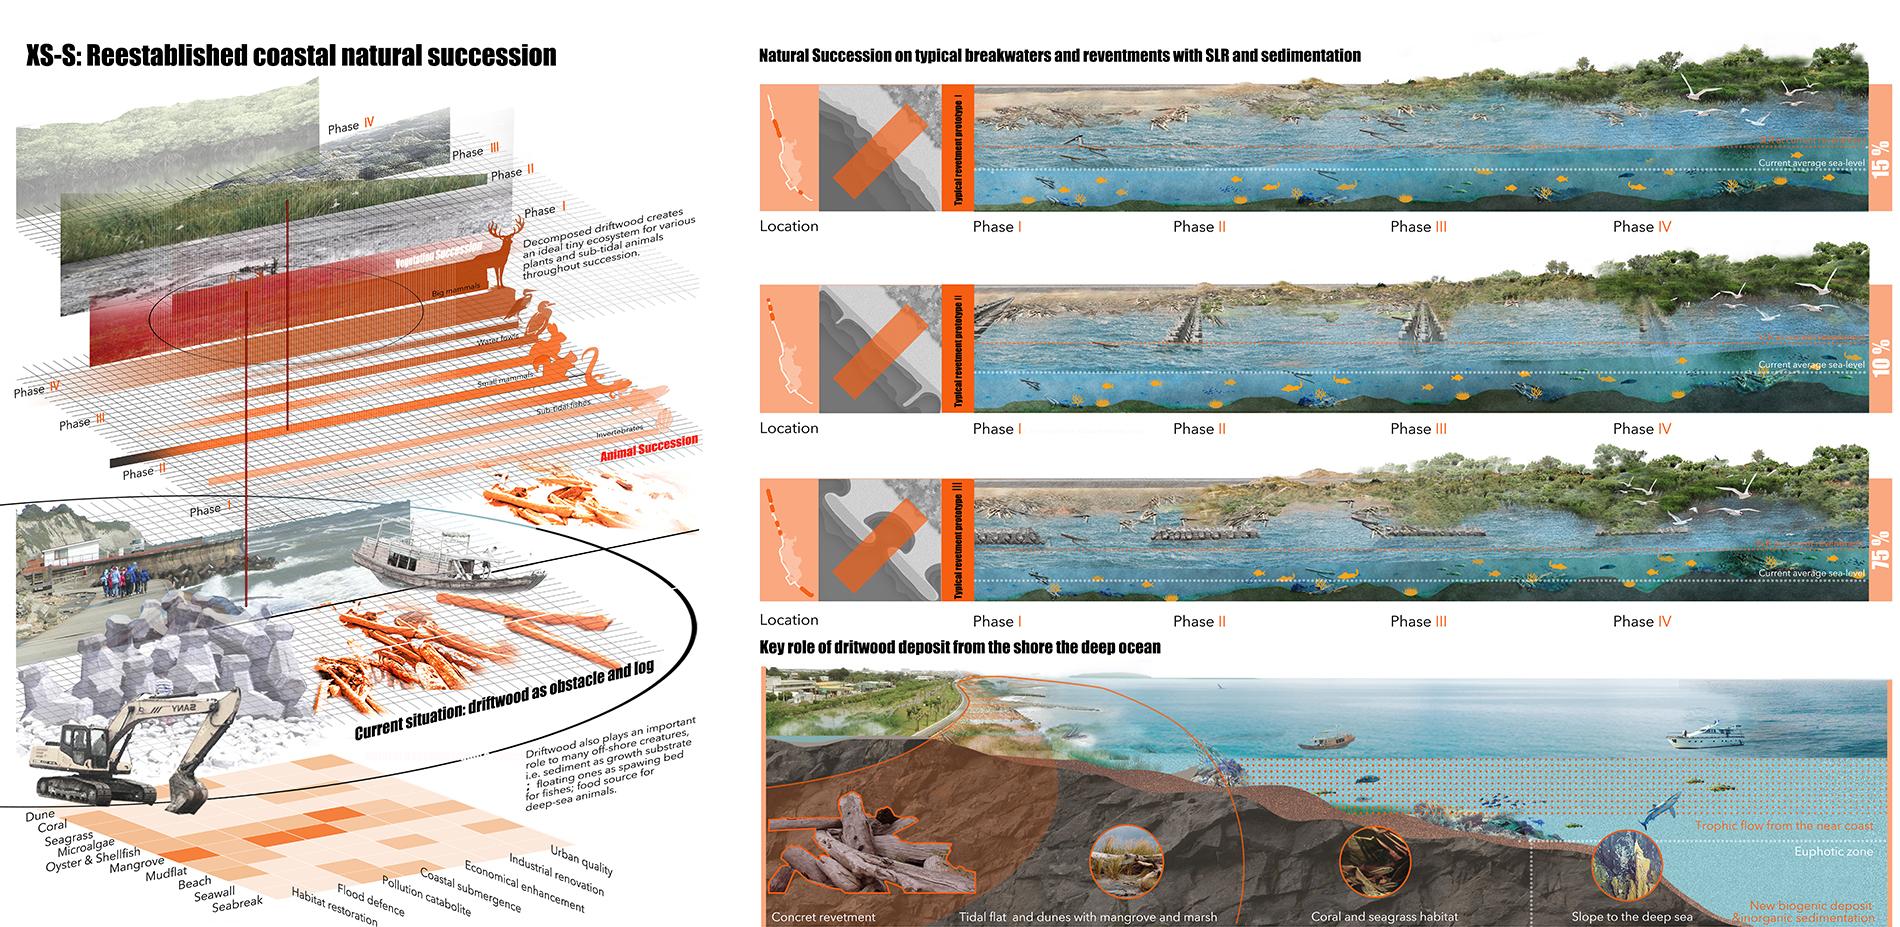 XS-S: Reestablished Coastal Natural Succession